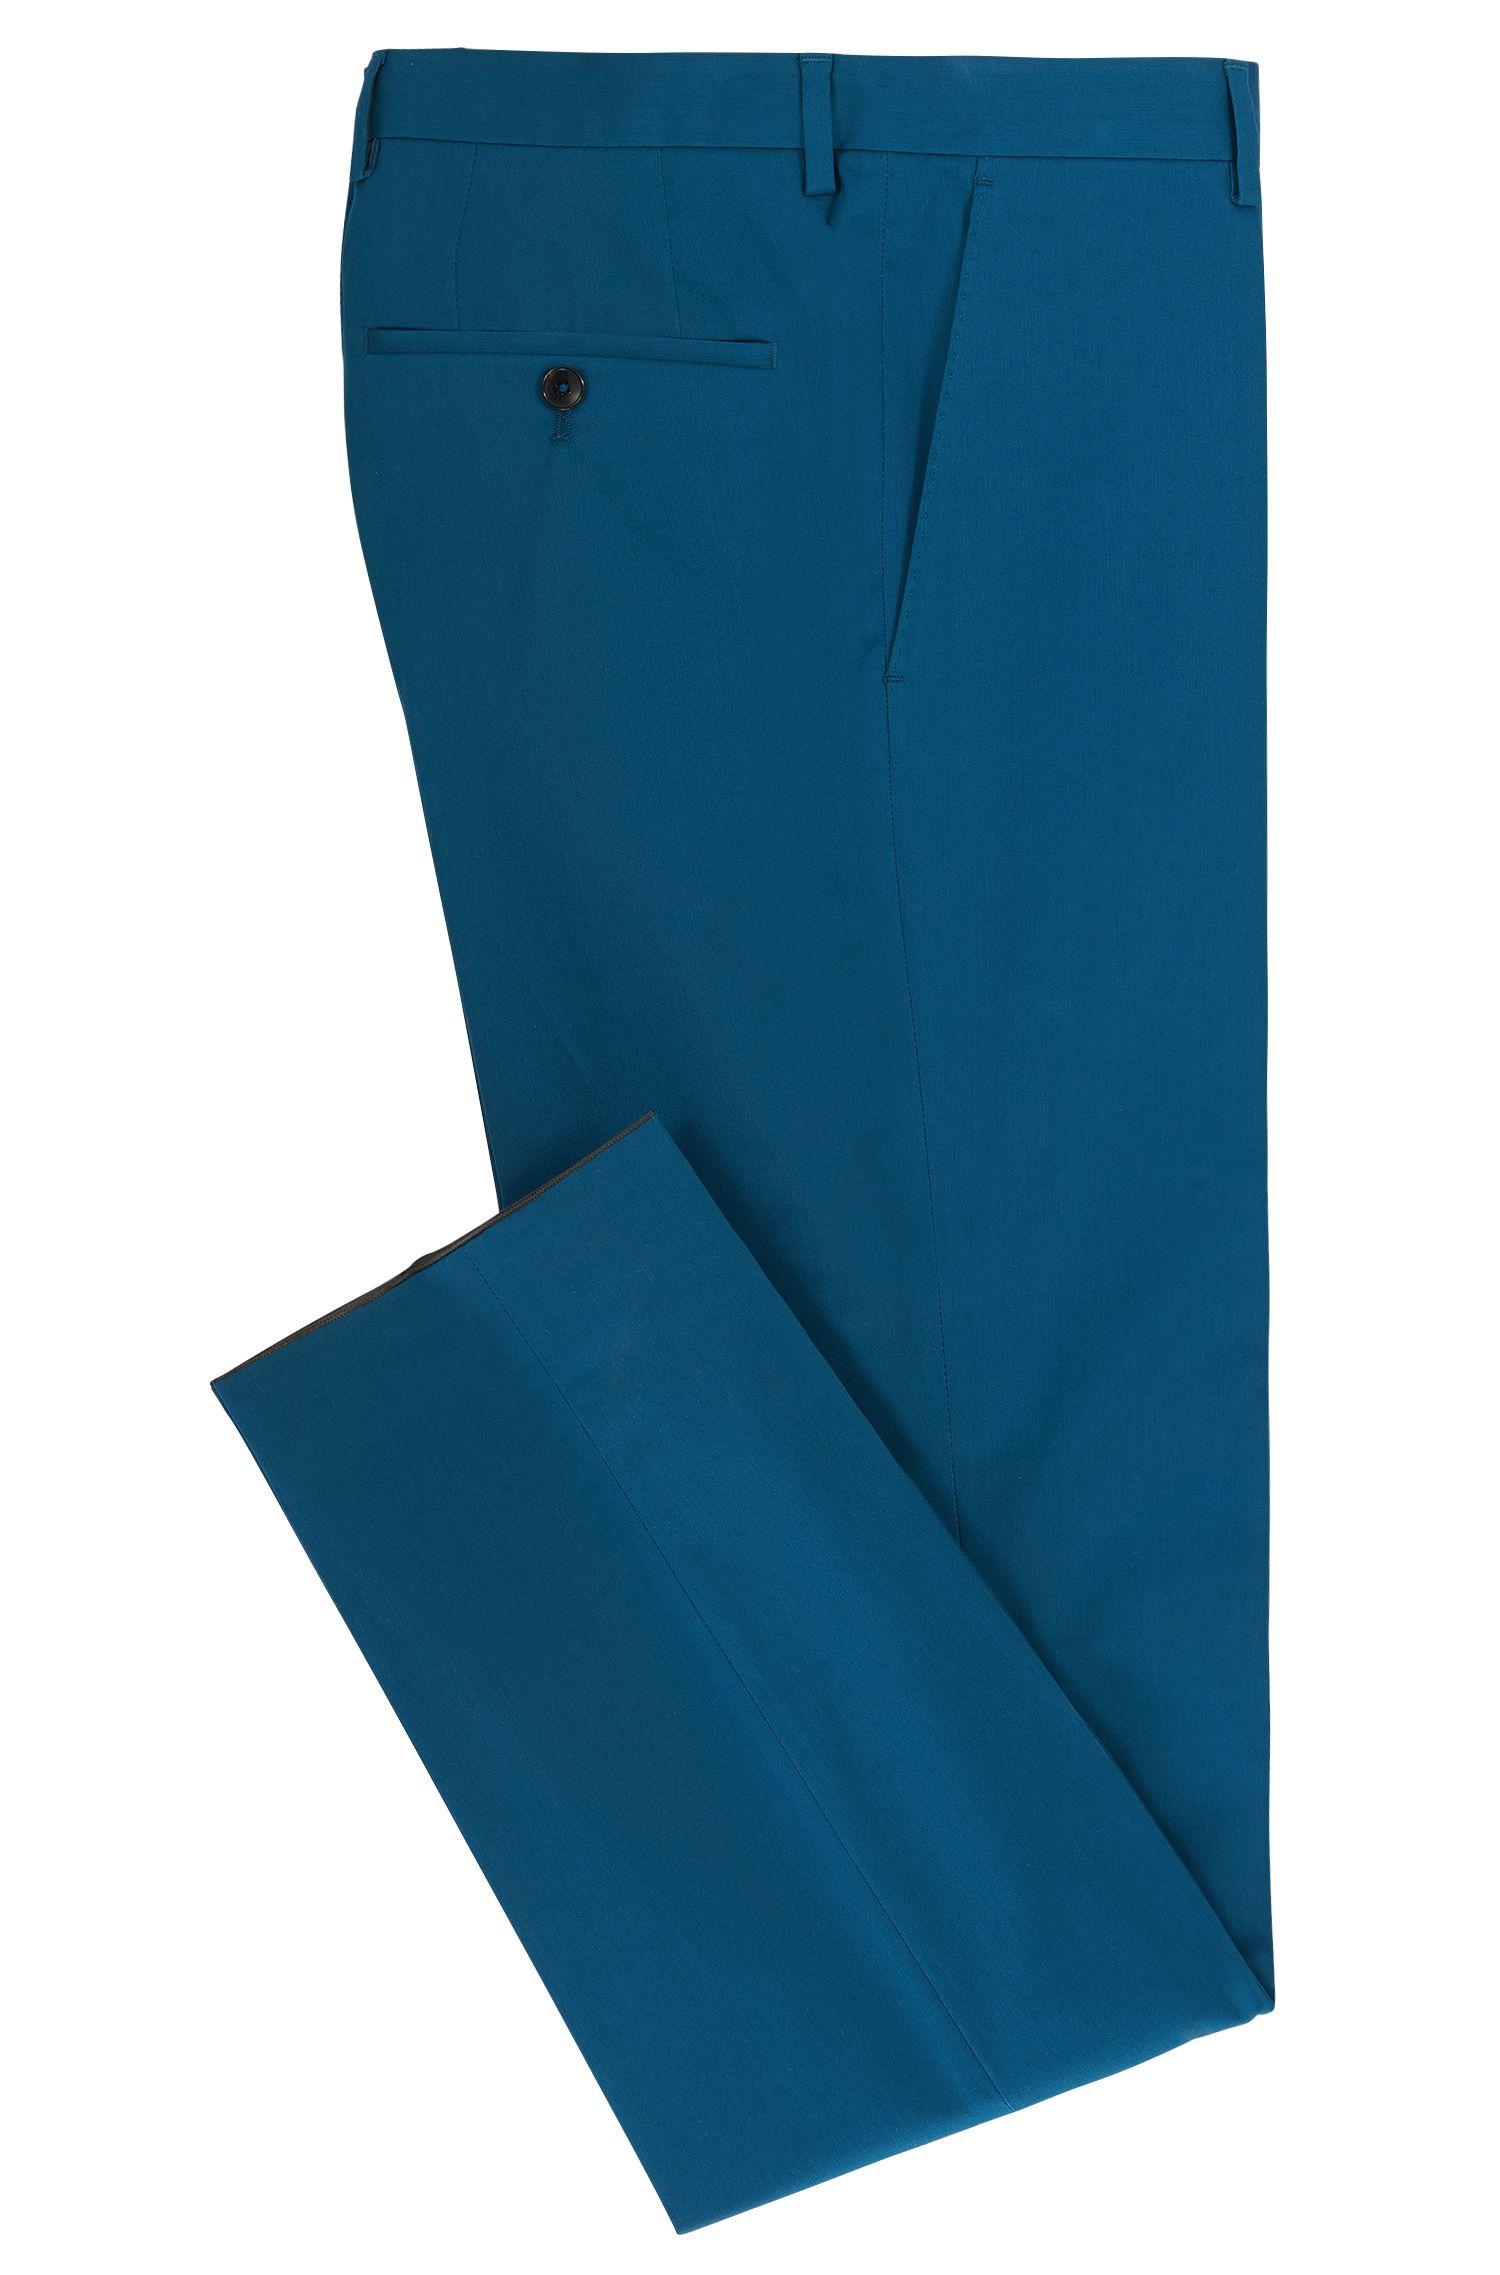 Stretch Cotton Dress Pant, Slim Fit | Genesis, Turquoise